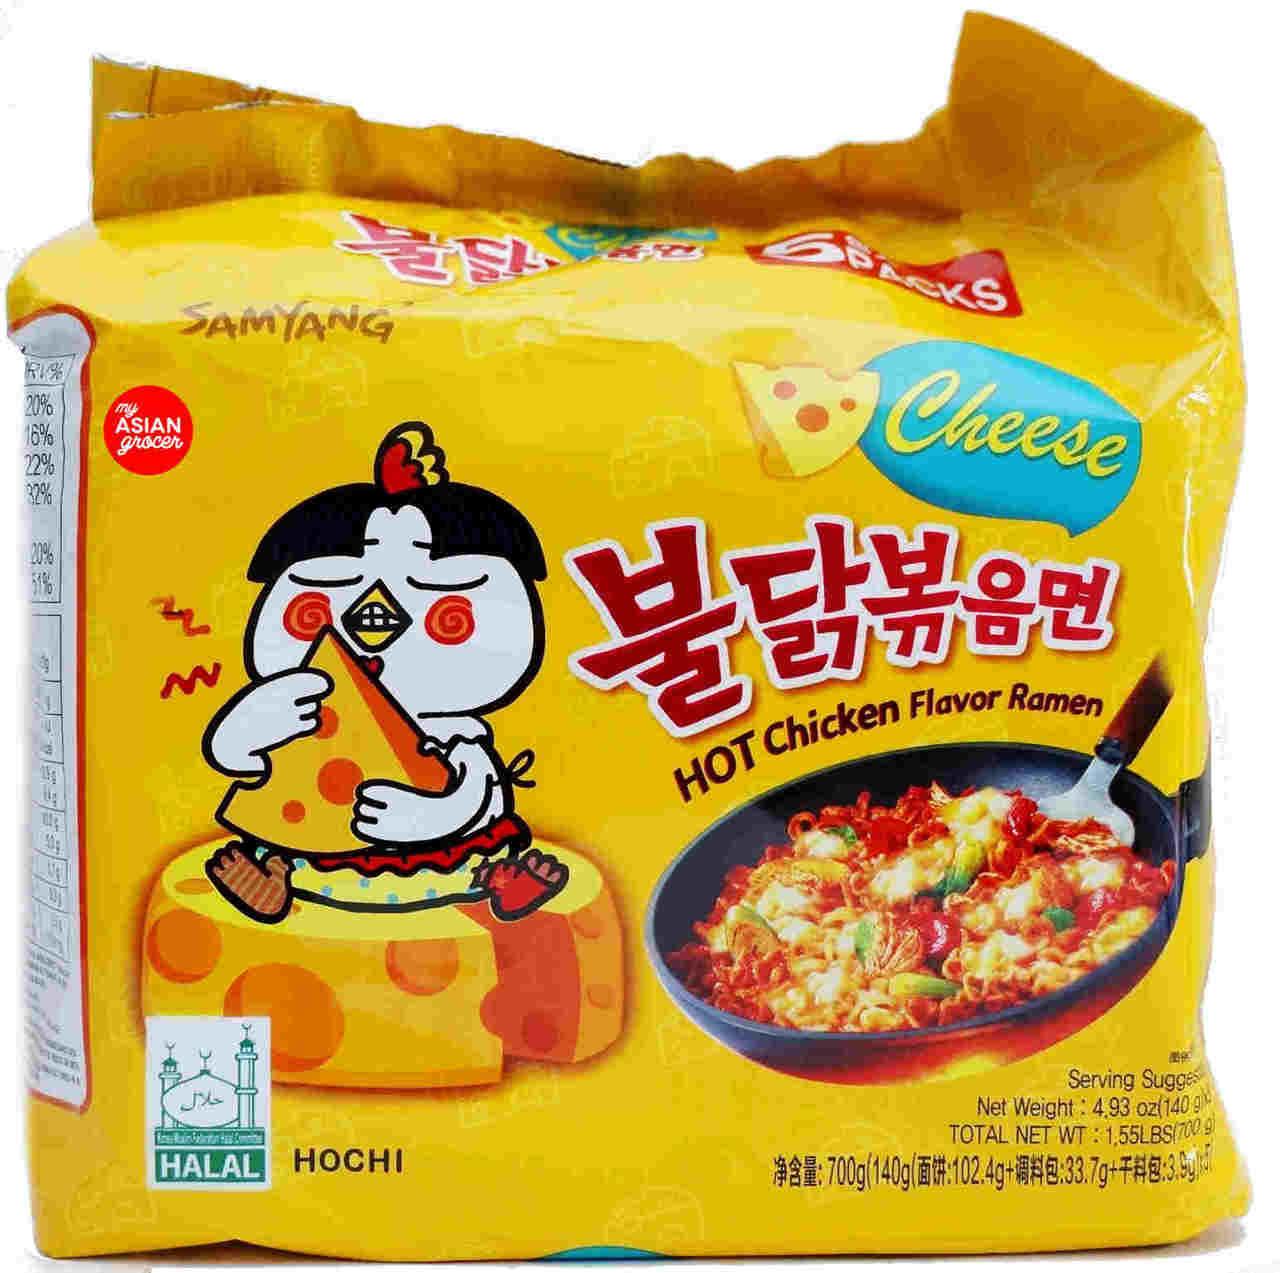 Samyang Hot Chicken with Cheese Ramen 140g x 5 Pack